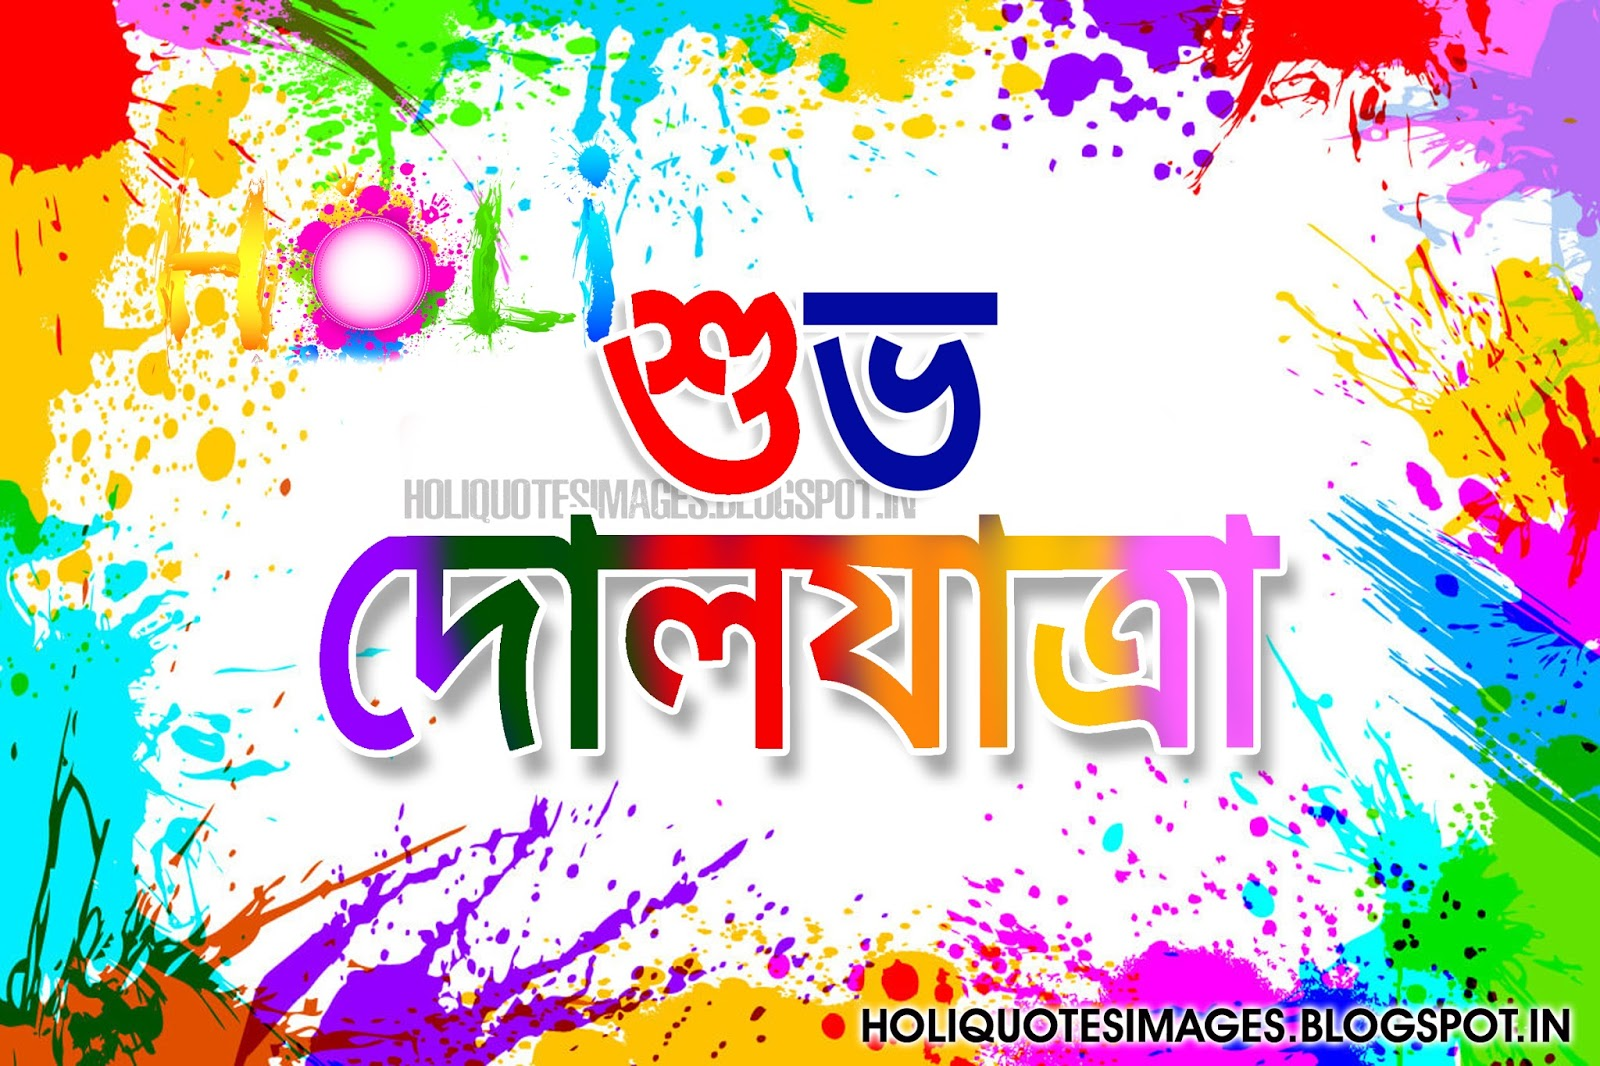 bengali Happy holi Quotes and sayings In Bangla | Holi Images